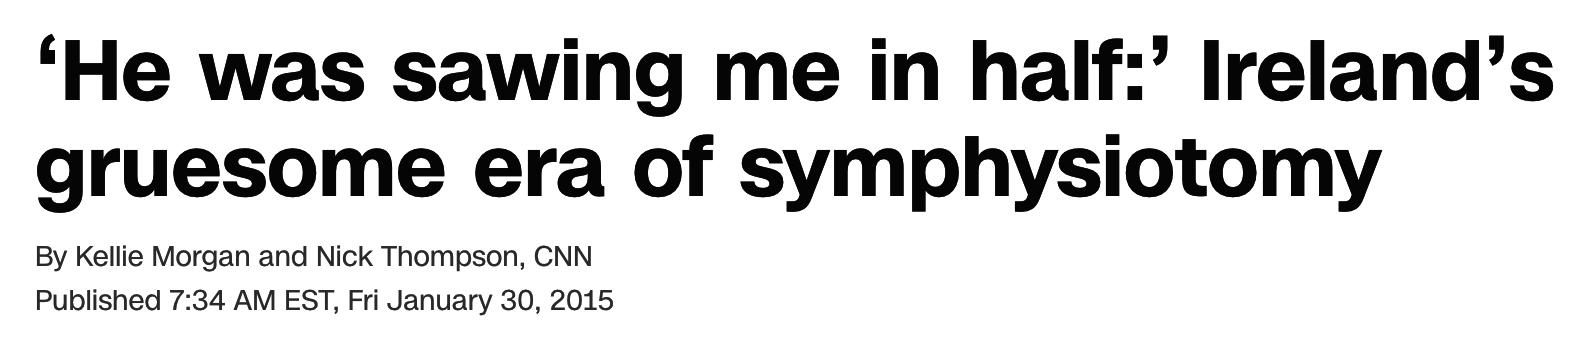 "Headline saying, ""He was sawing me in half."""